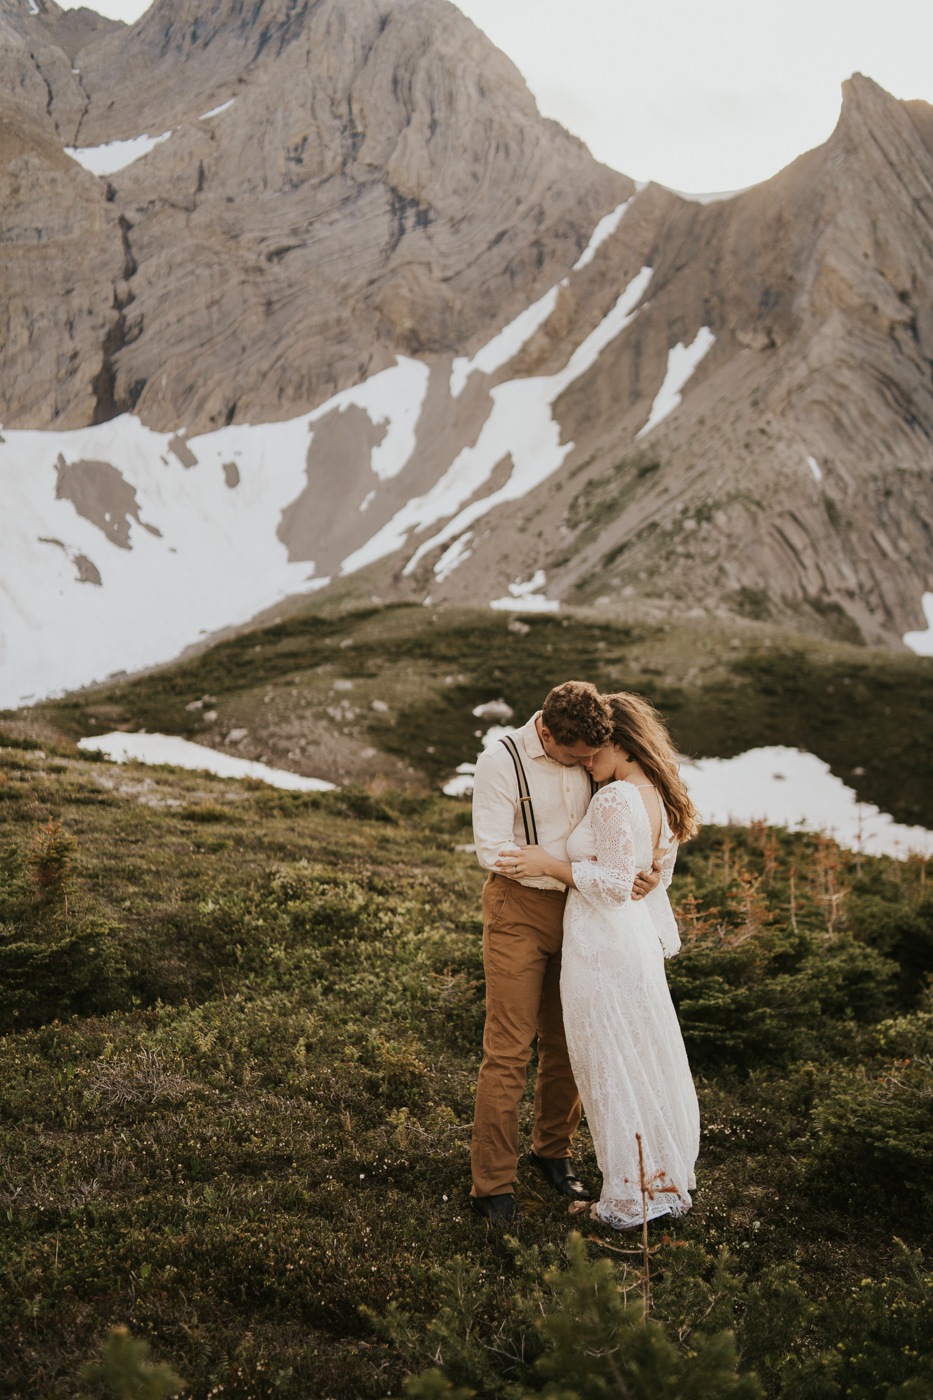 tyraephotography_photographer_wedding_elopement_engagement_photography-07996.jpg